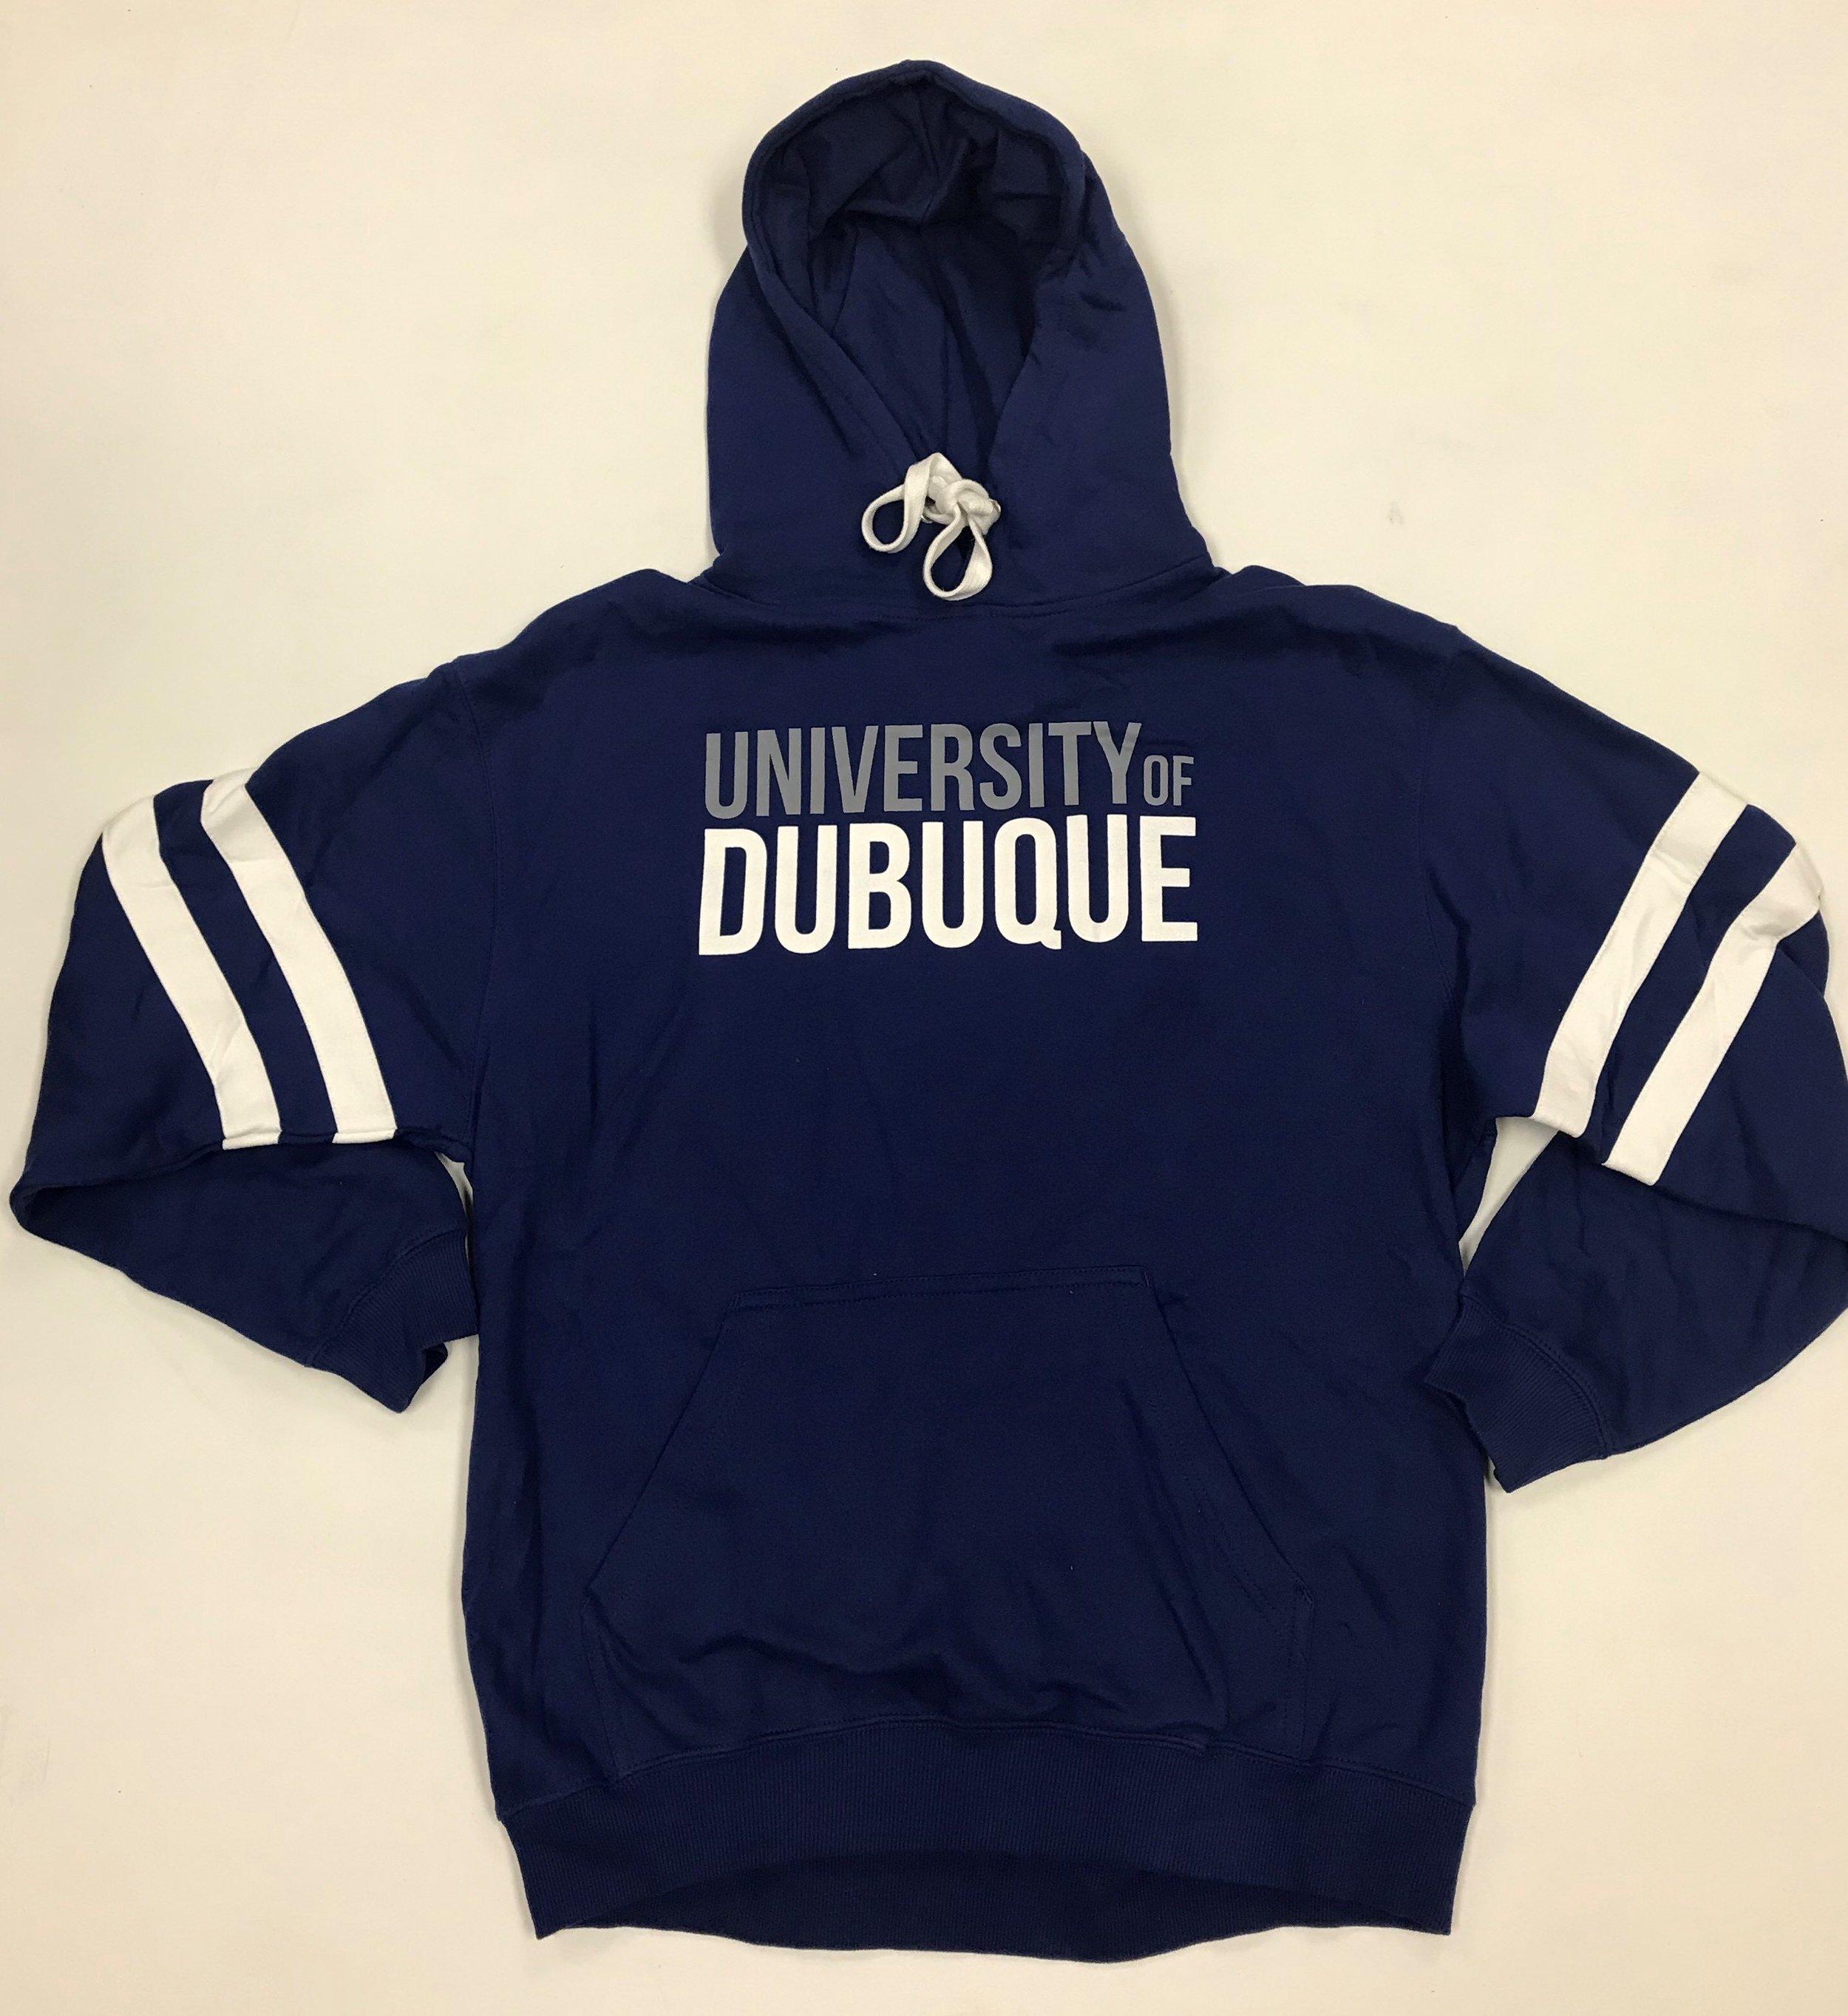 University of Dubuque.jpg